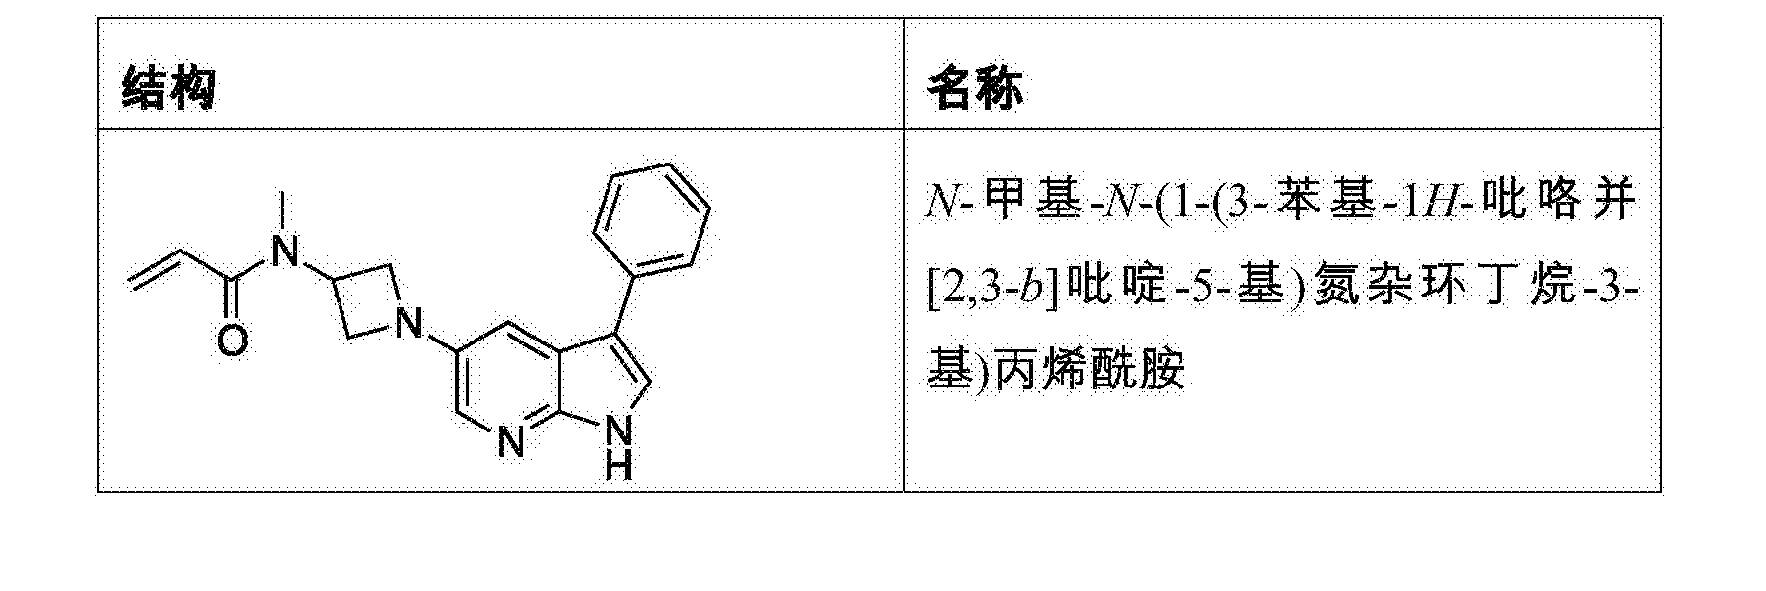 Figure CN107278202AD01002